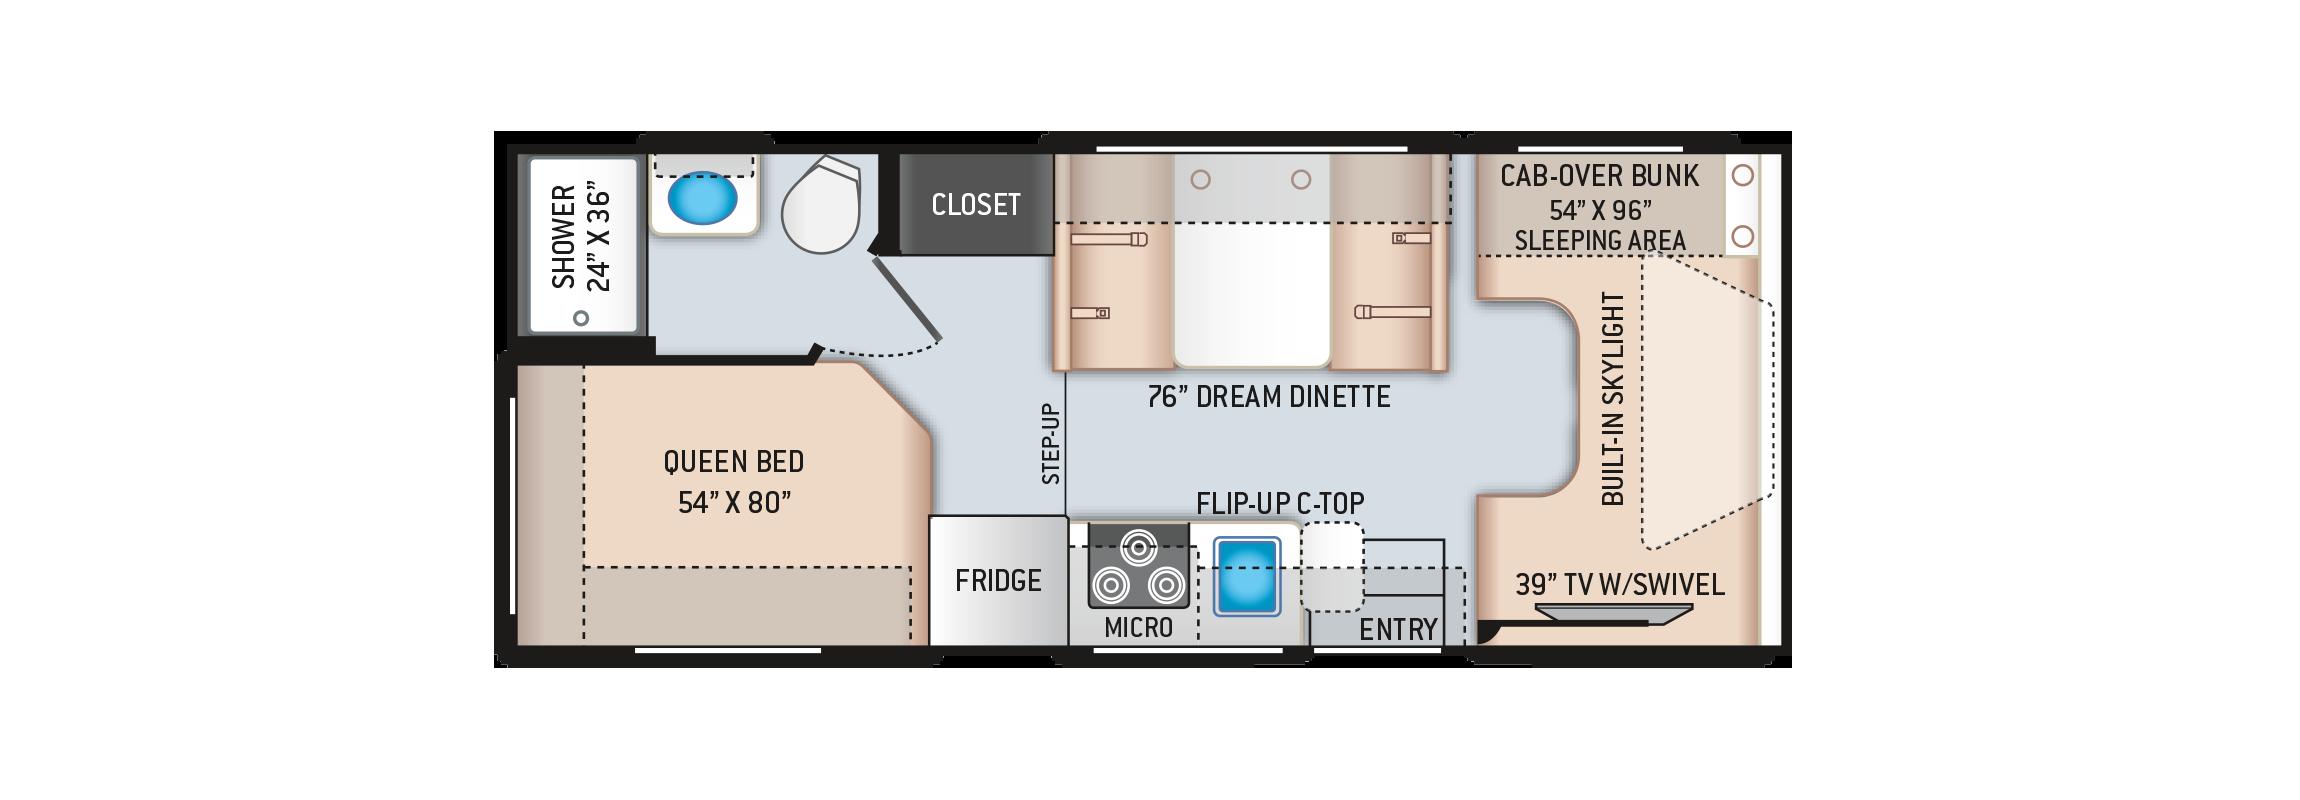 Quantum LC Class C Motorhome LC22 Floor Plan